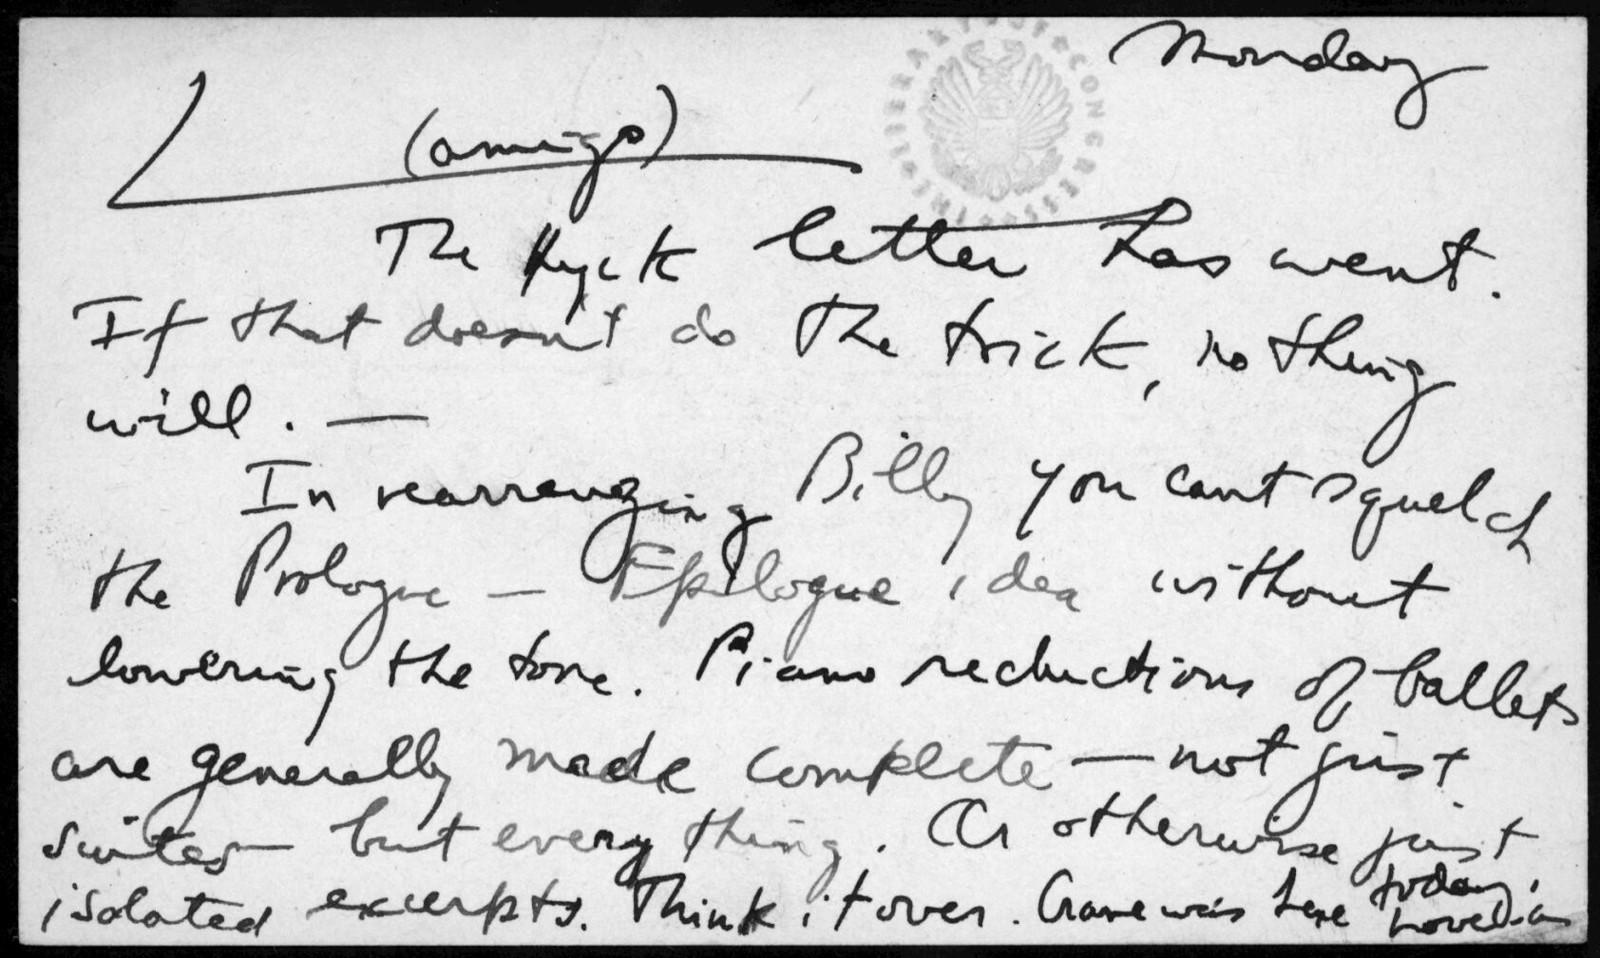 Letter from Aaron Copland to Leonard Bernstein, 1941